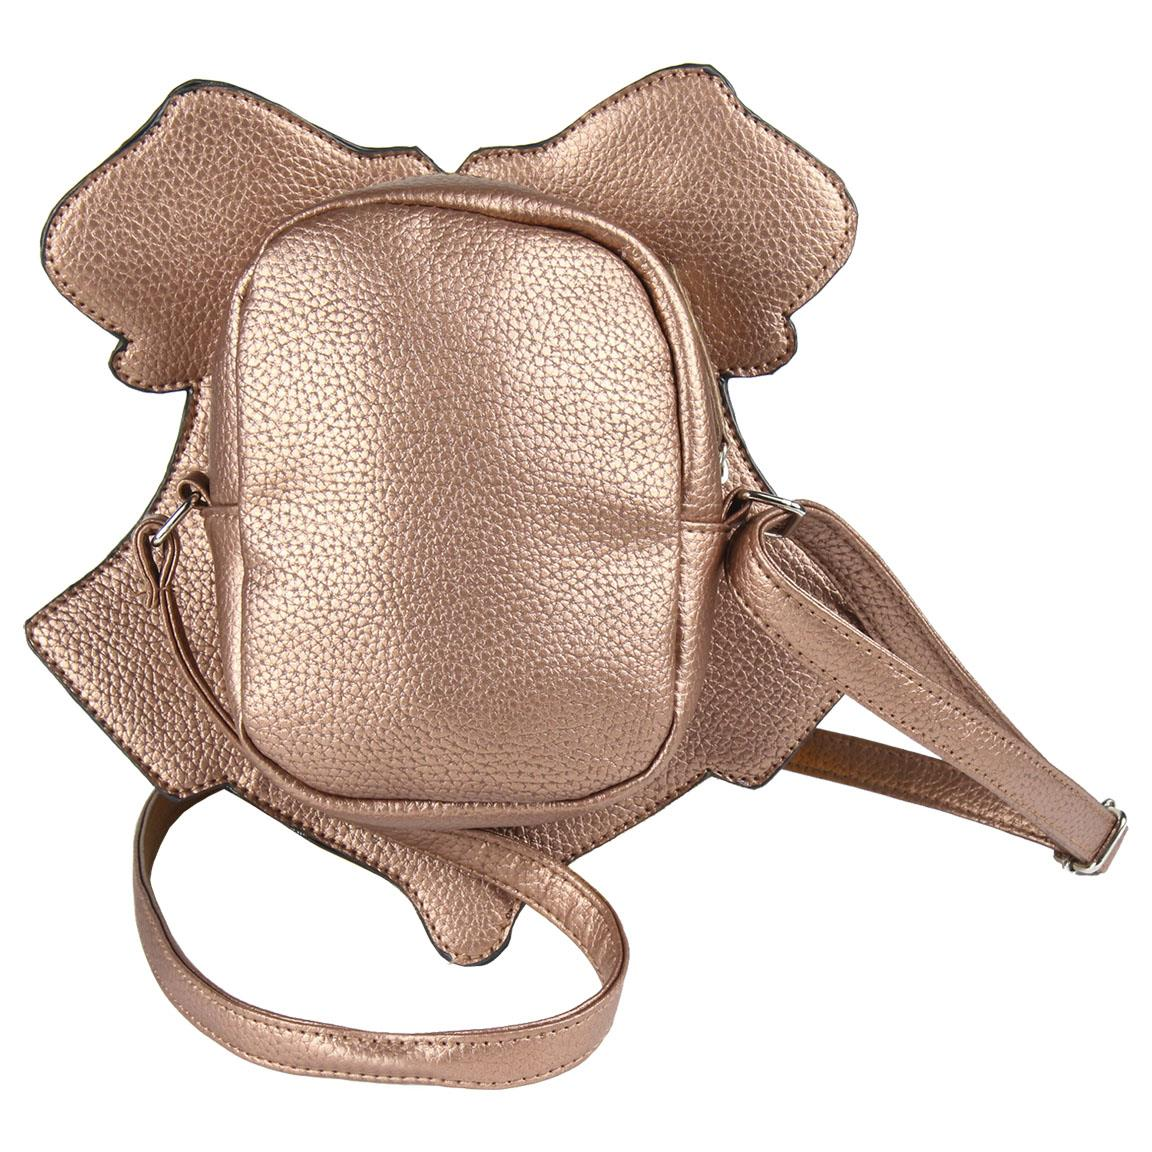 HARRY POTTER 3D CROSSBODY BAG